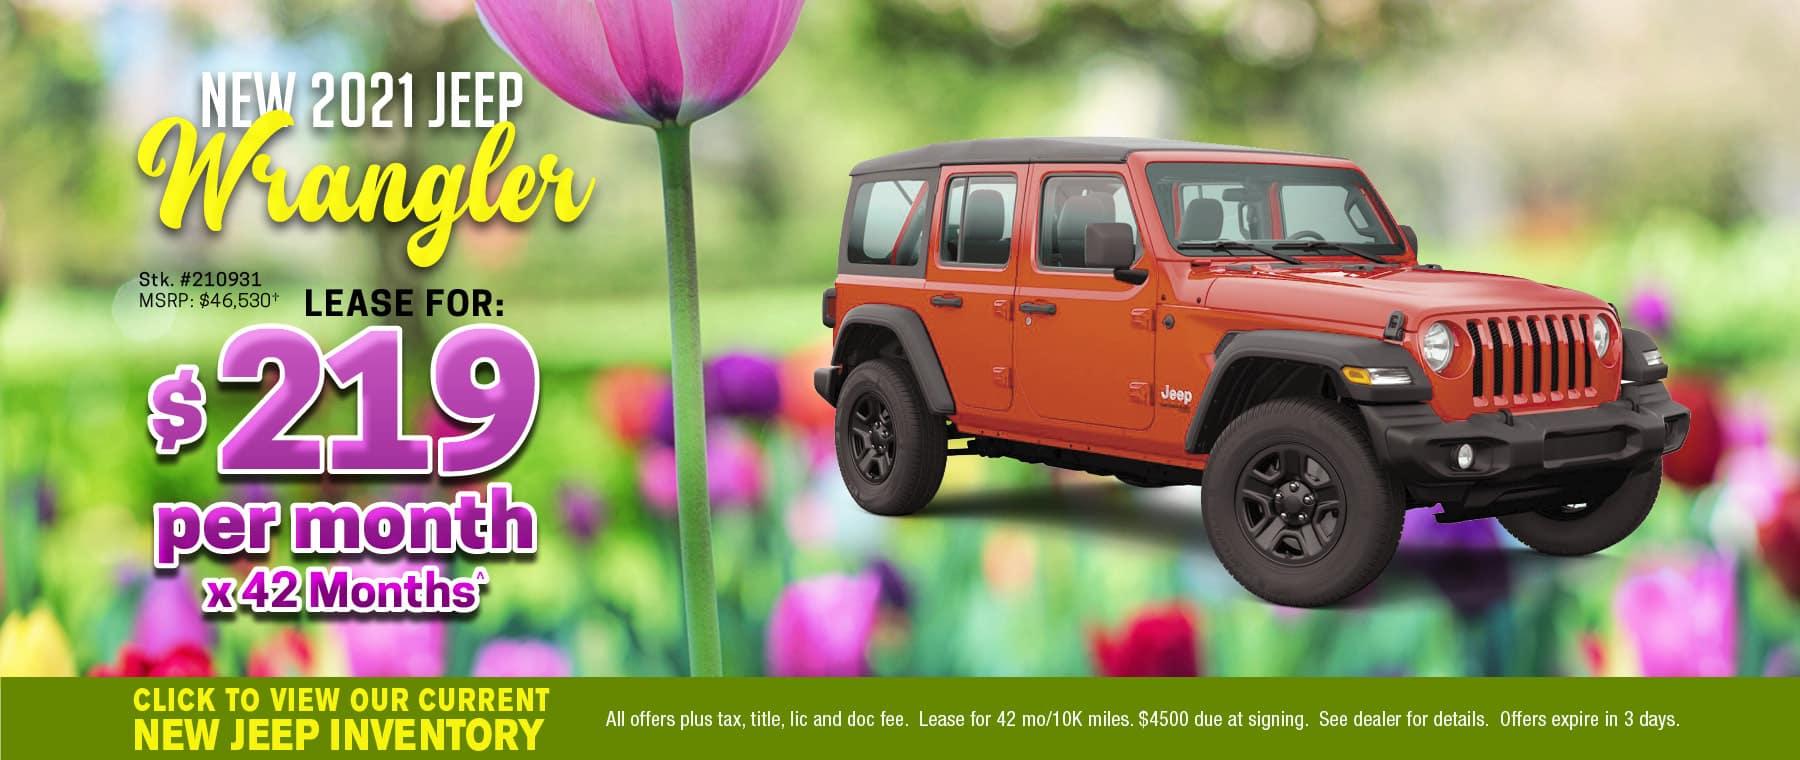 69045-ZCDJ_webslides_1800x760_600x253_Blooming-Wrangler